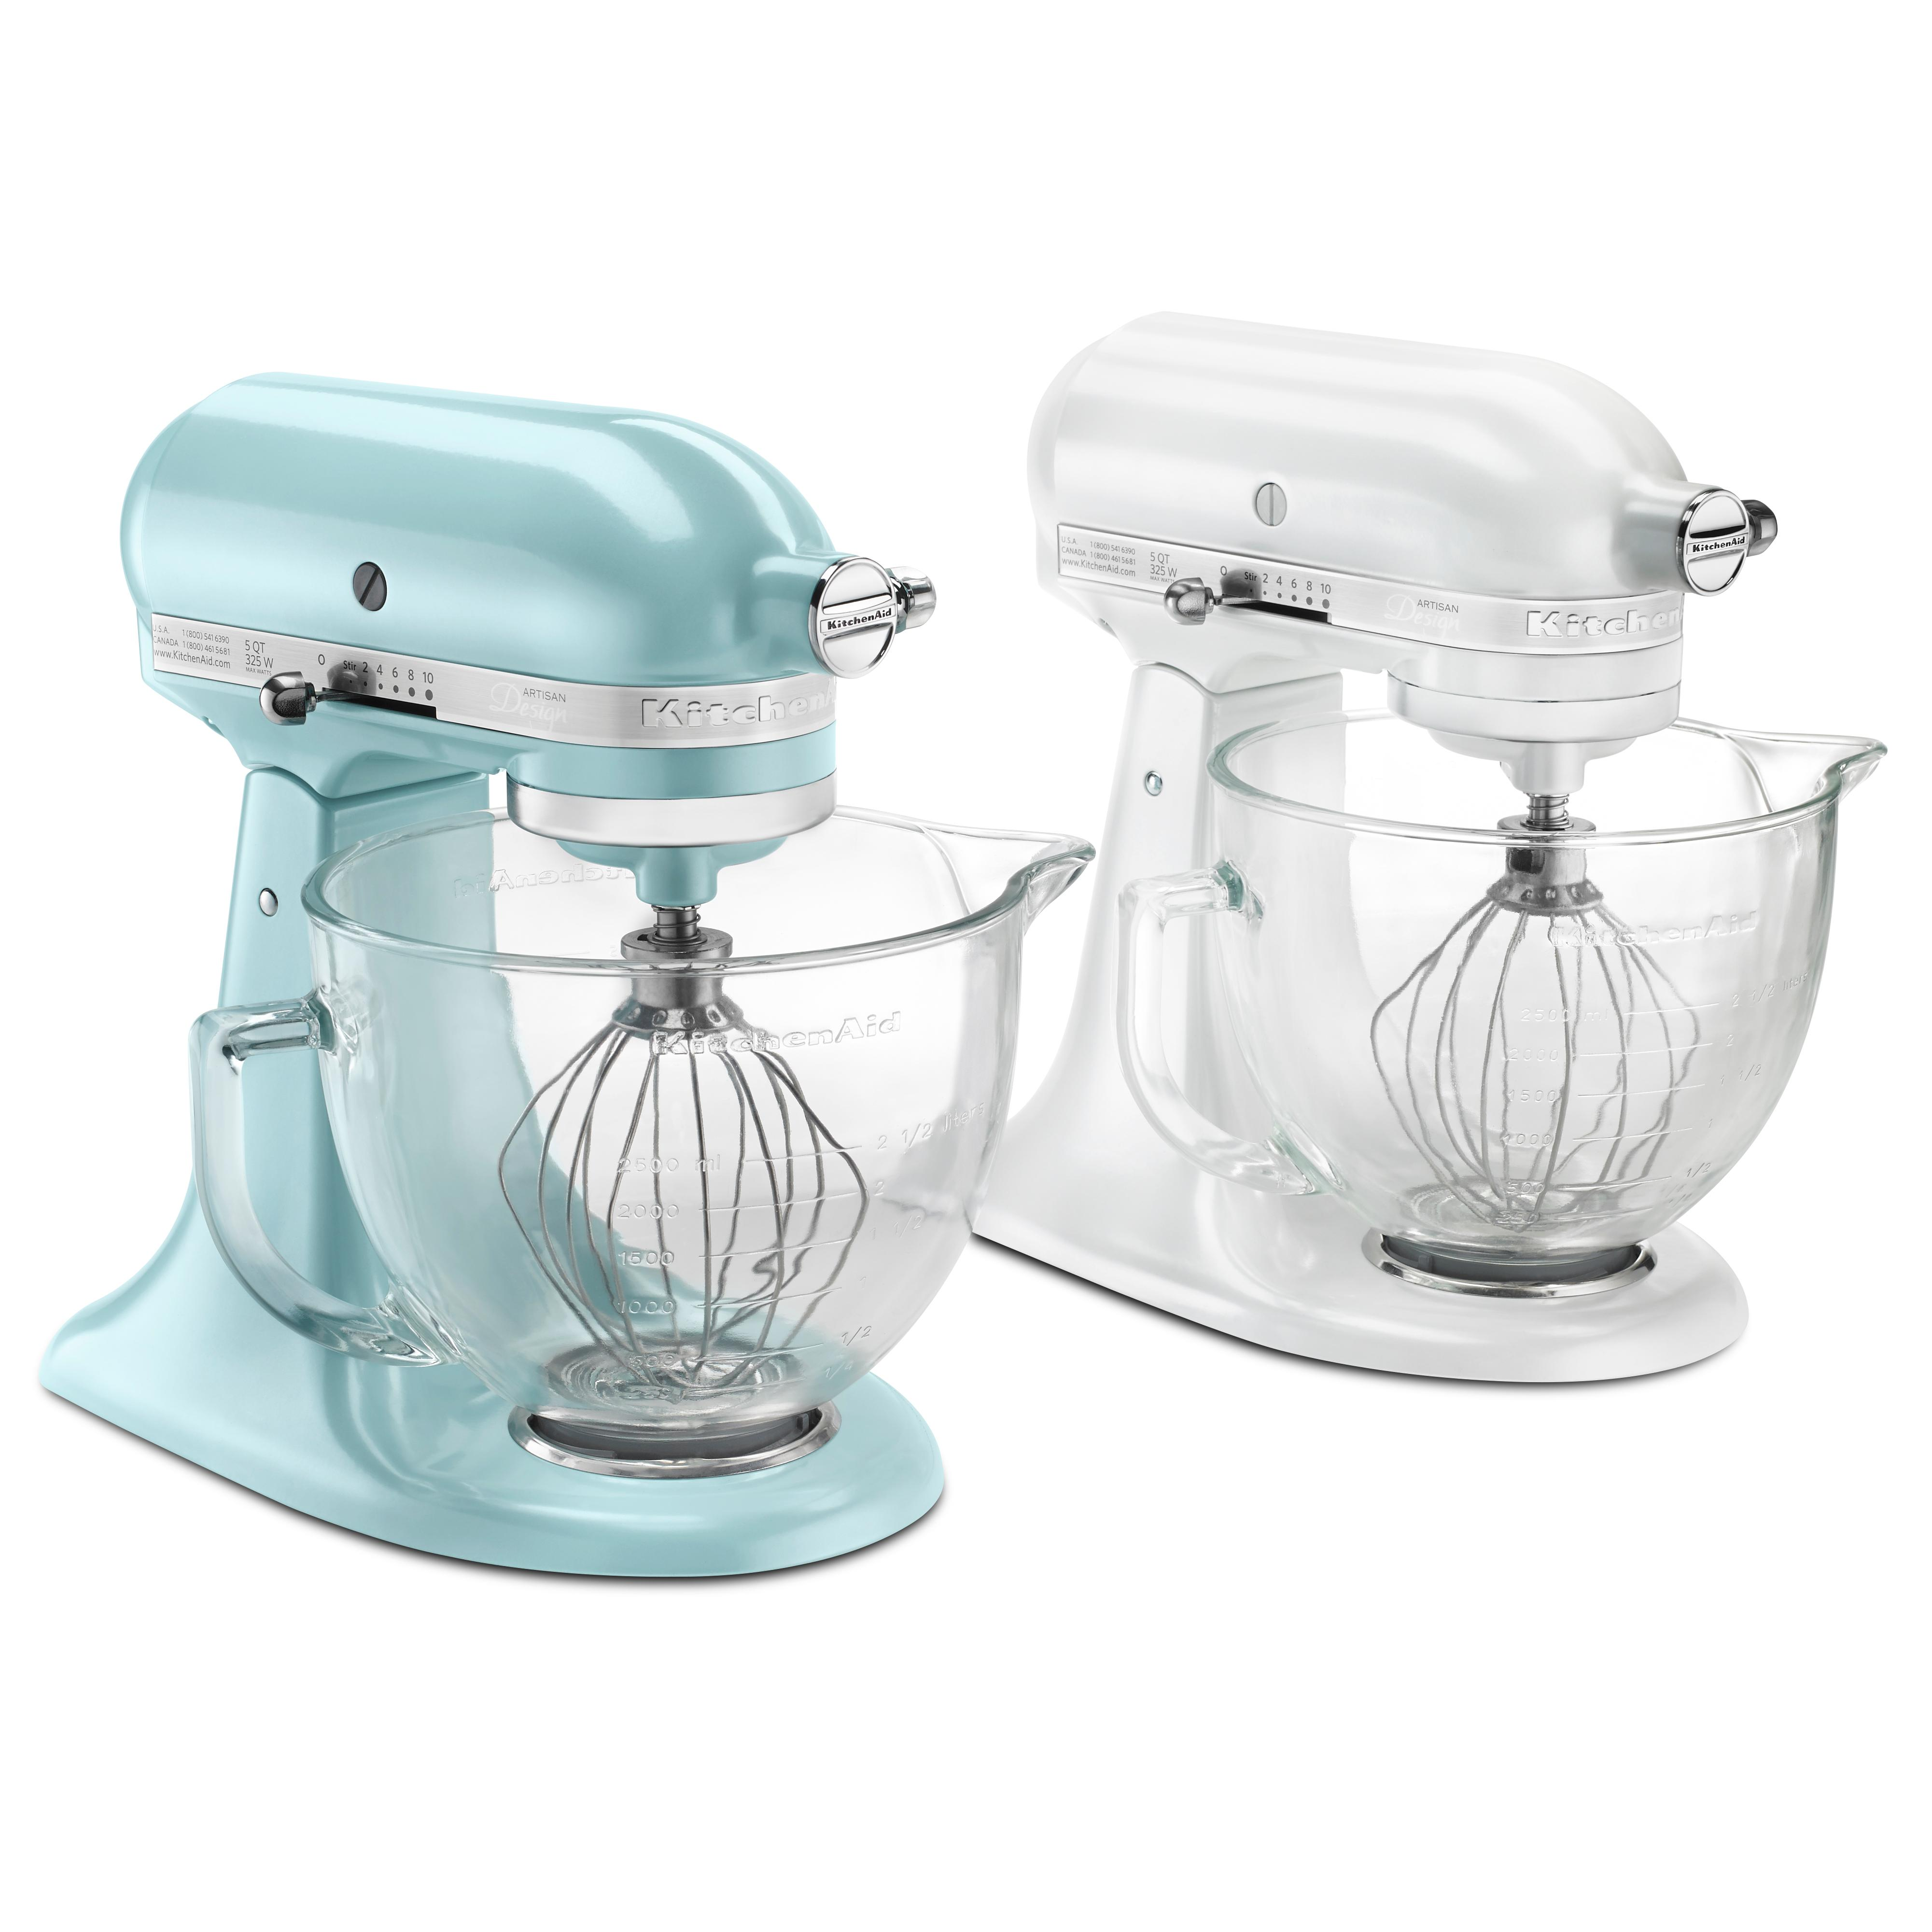 Kitchenaid Hand Mixer Colors Kitchen Ideas